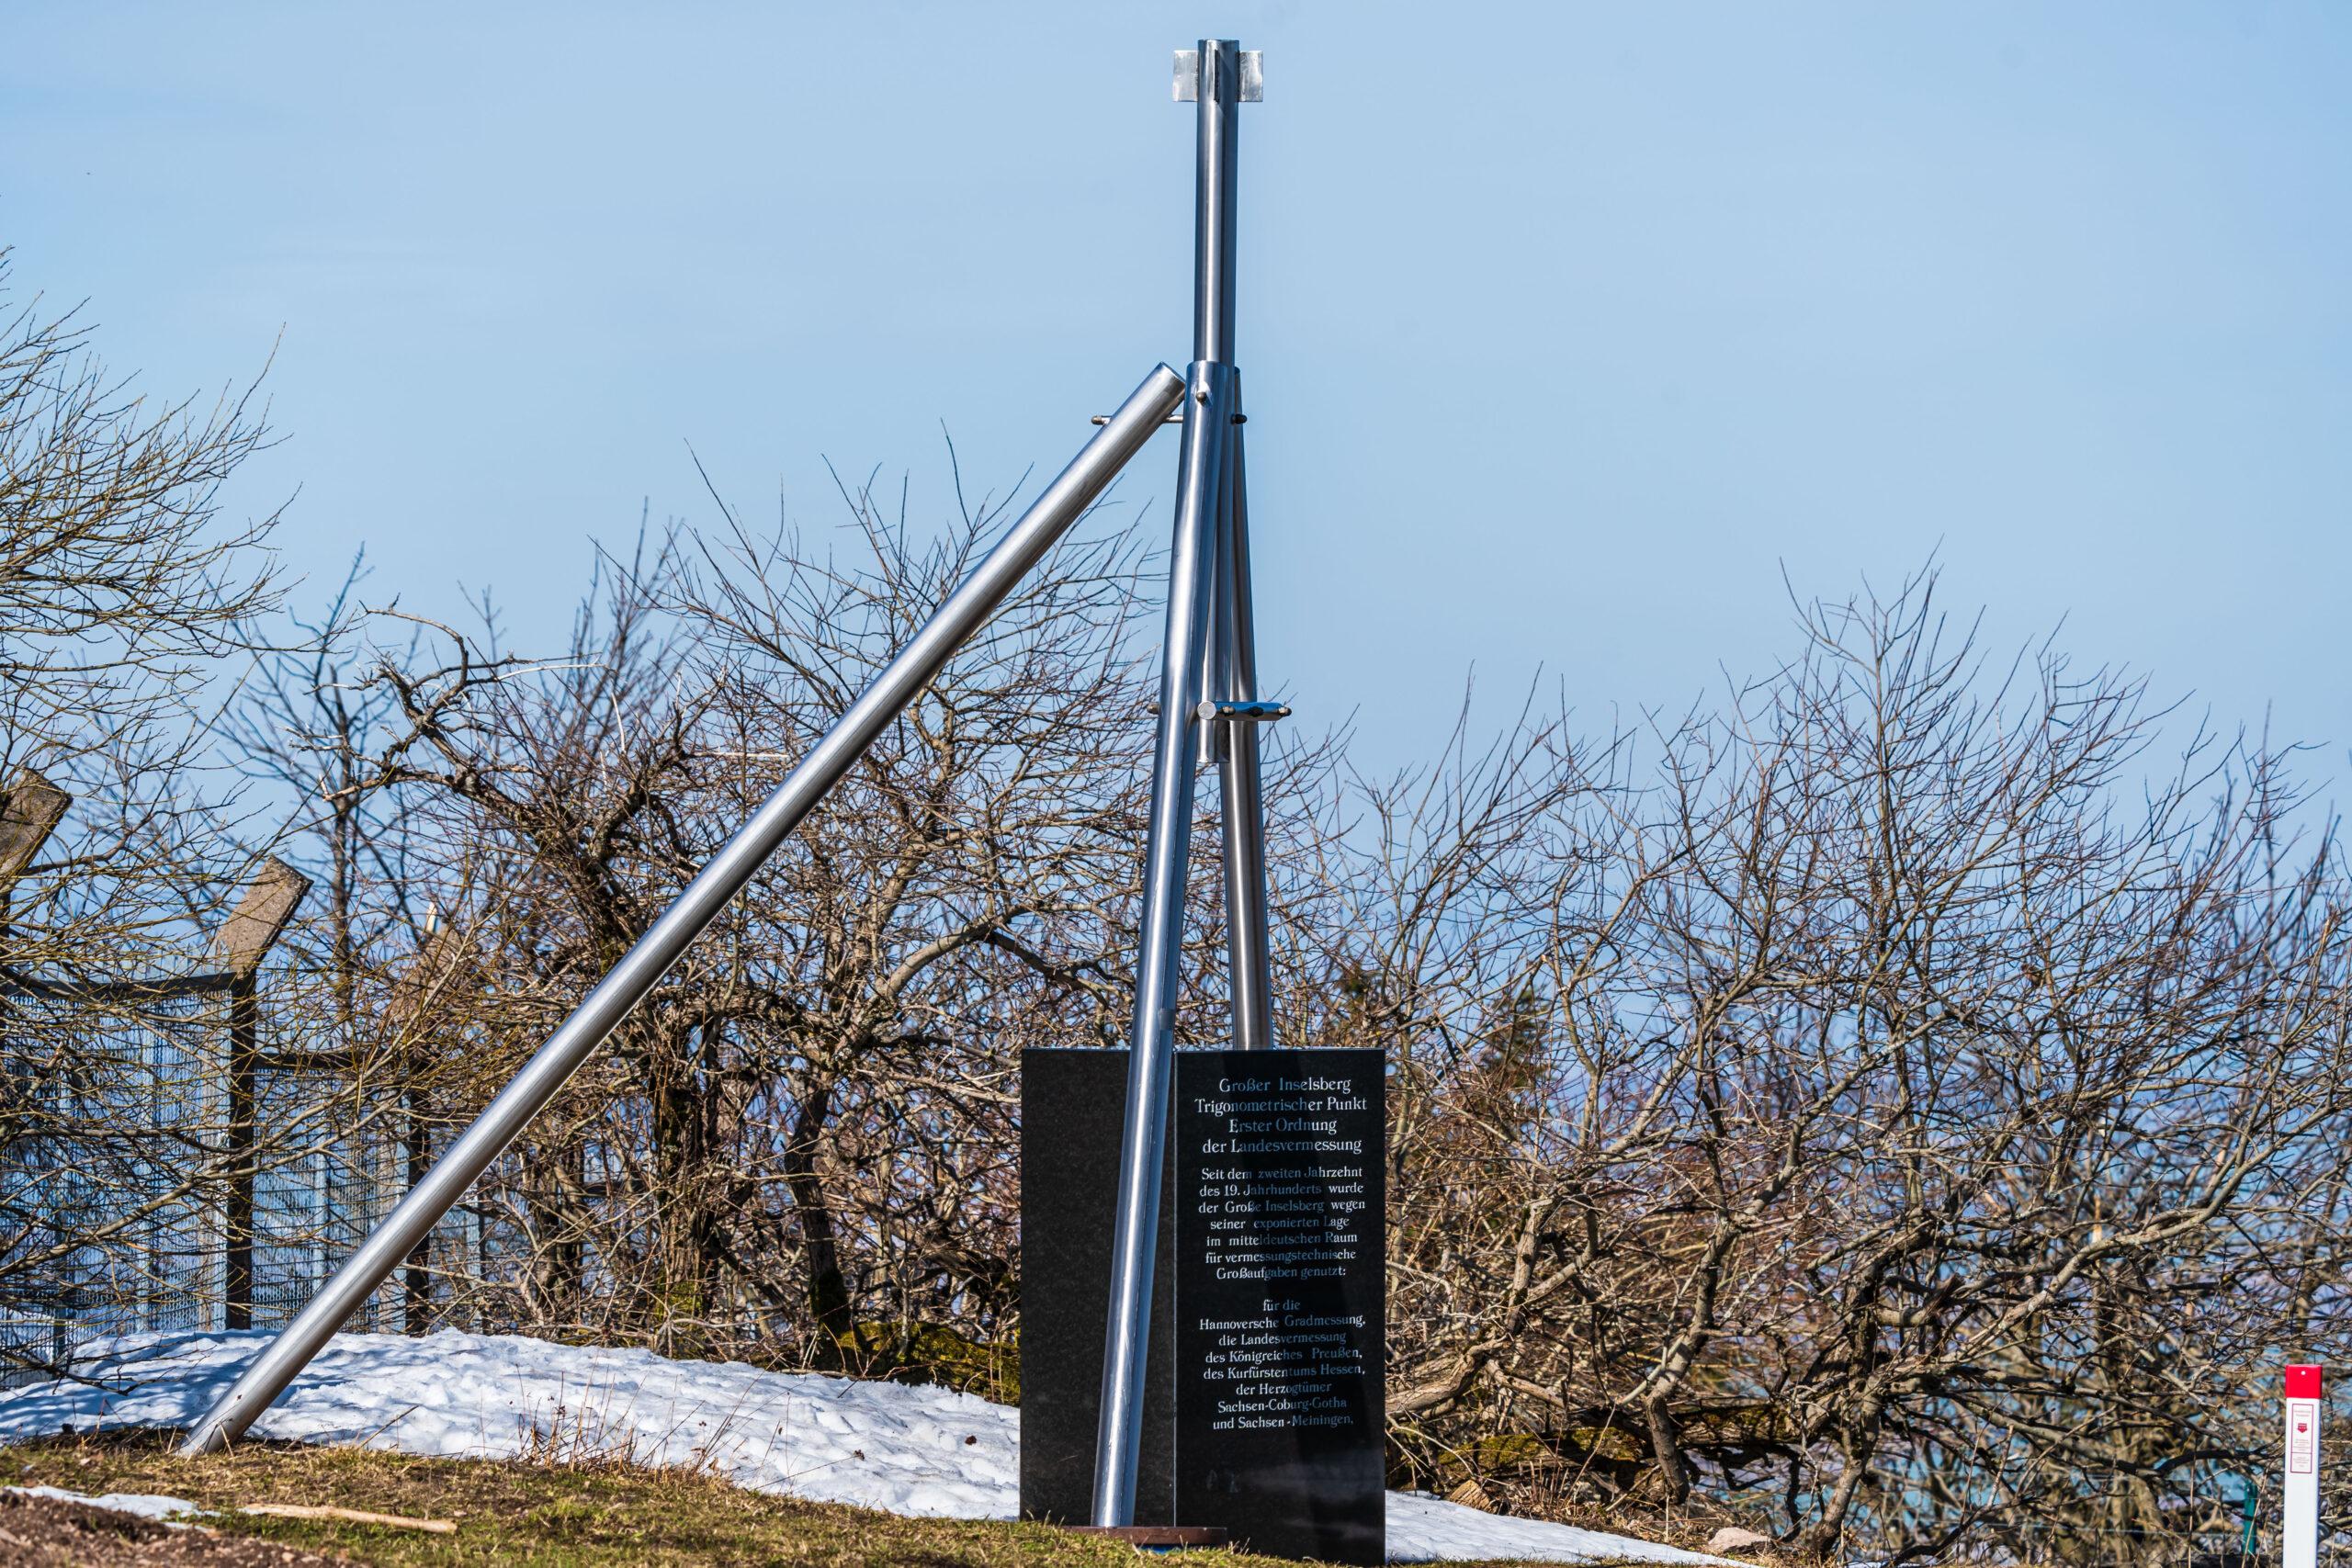 Inselsberg, Trigonometrischer Punkt